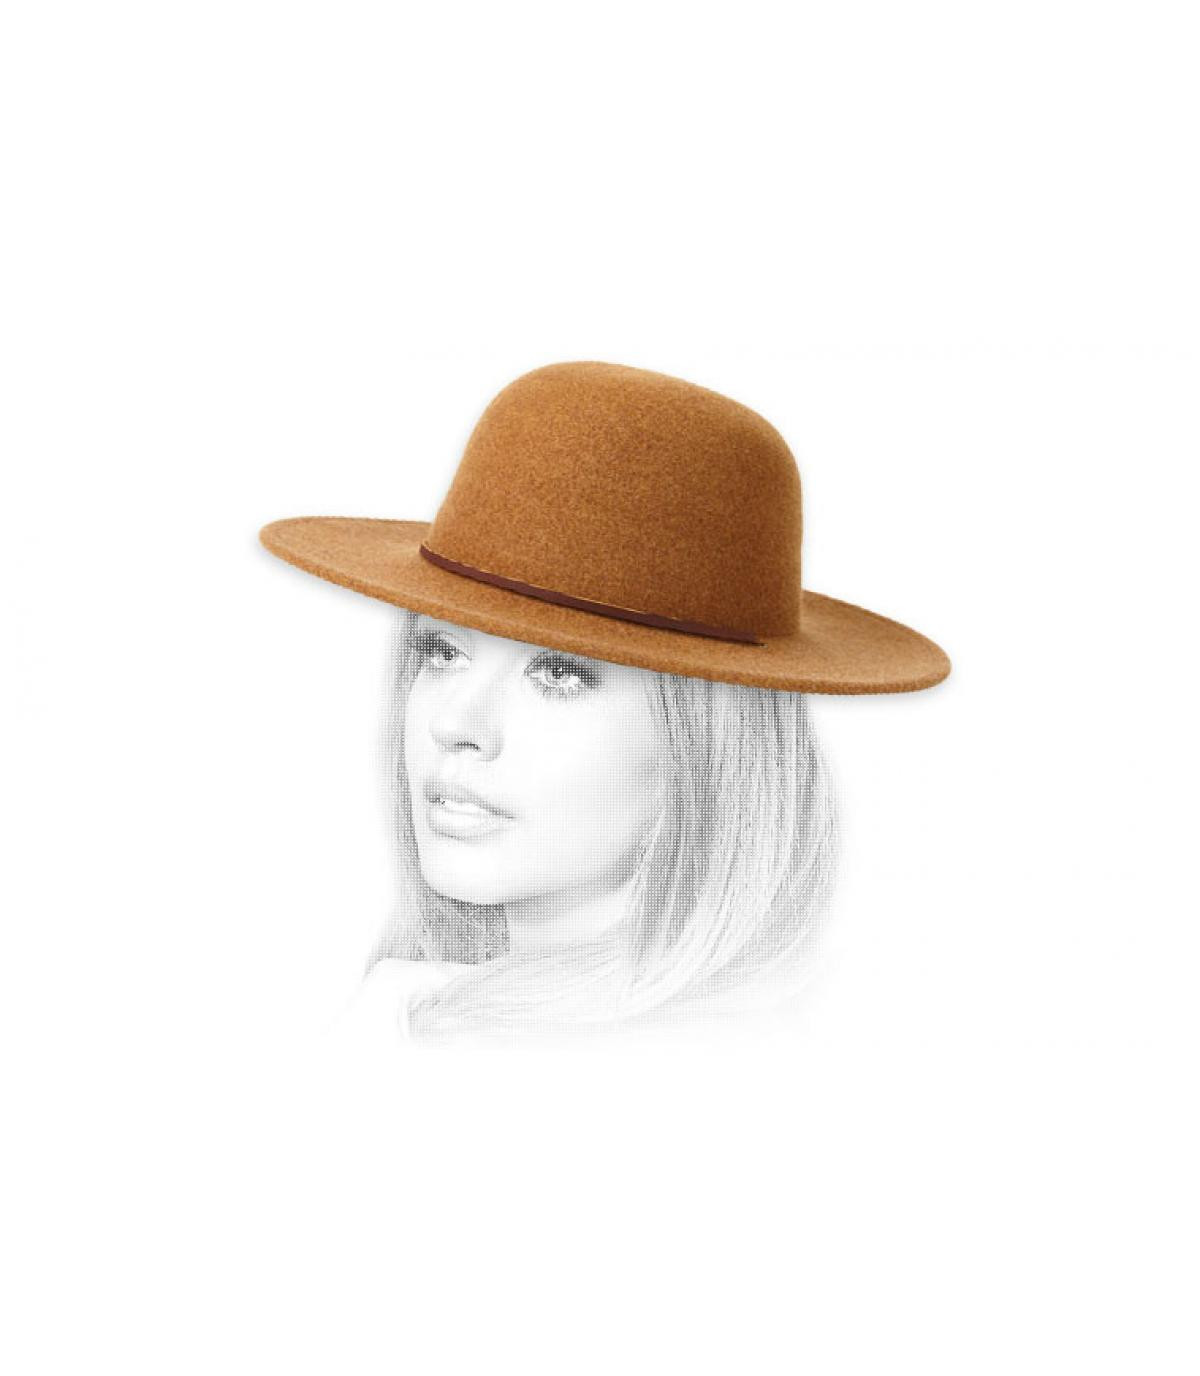 chapeau feutre femme beige